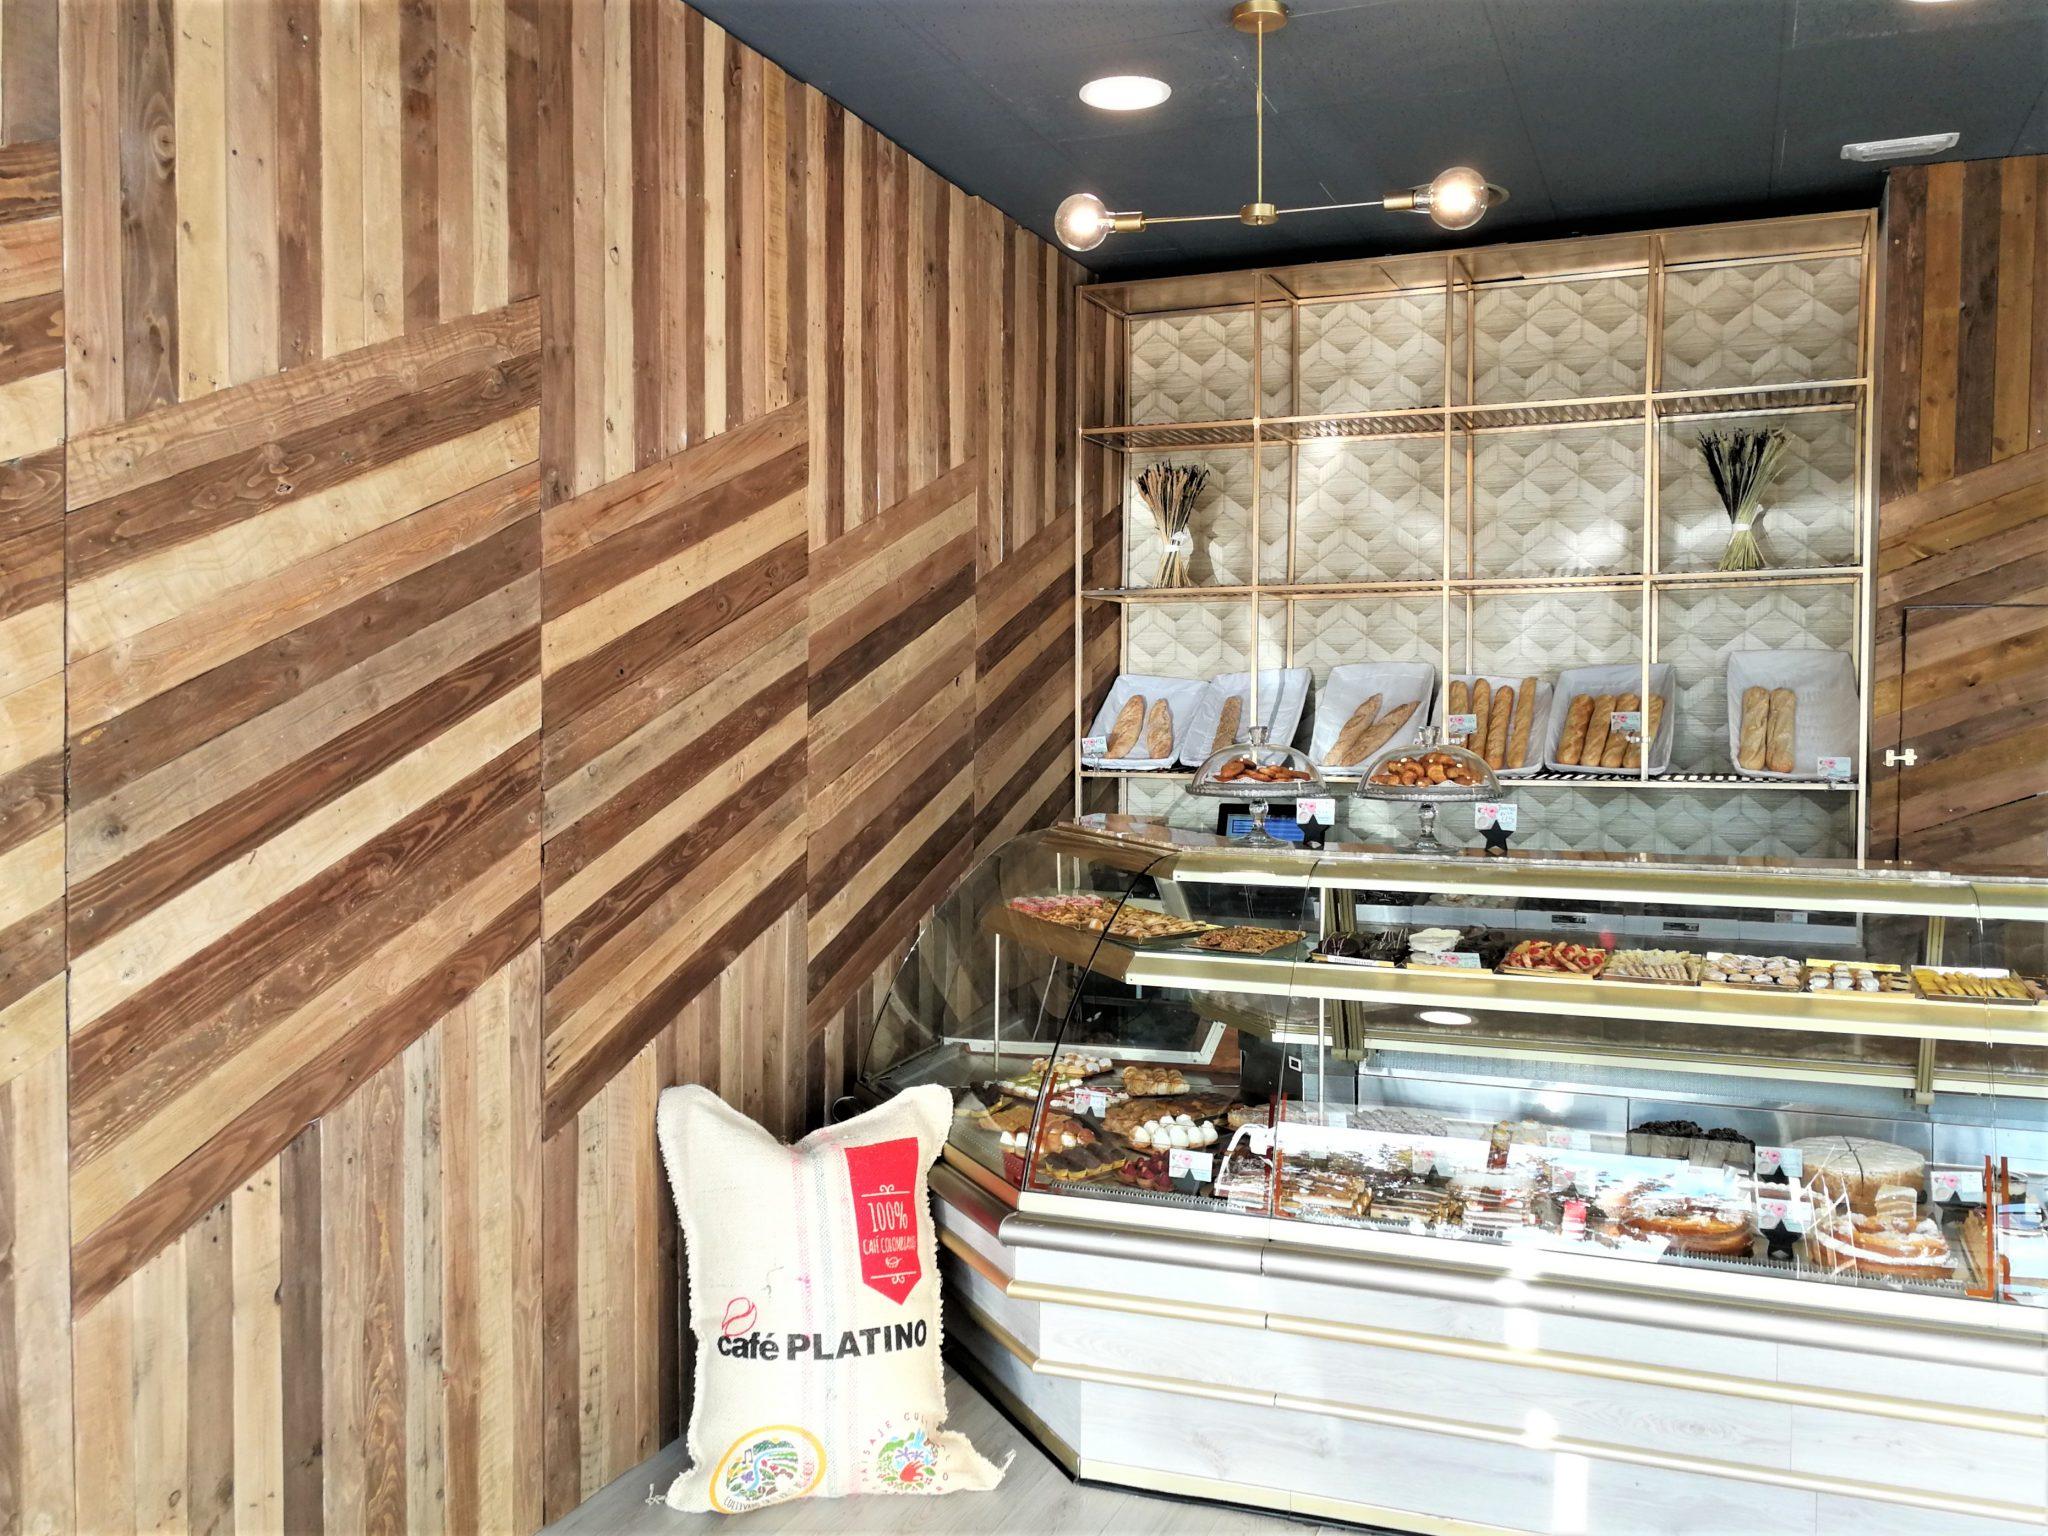 dpales. panelado madera reciclada